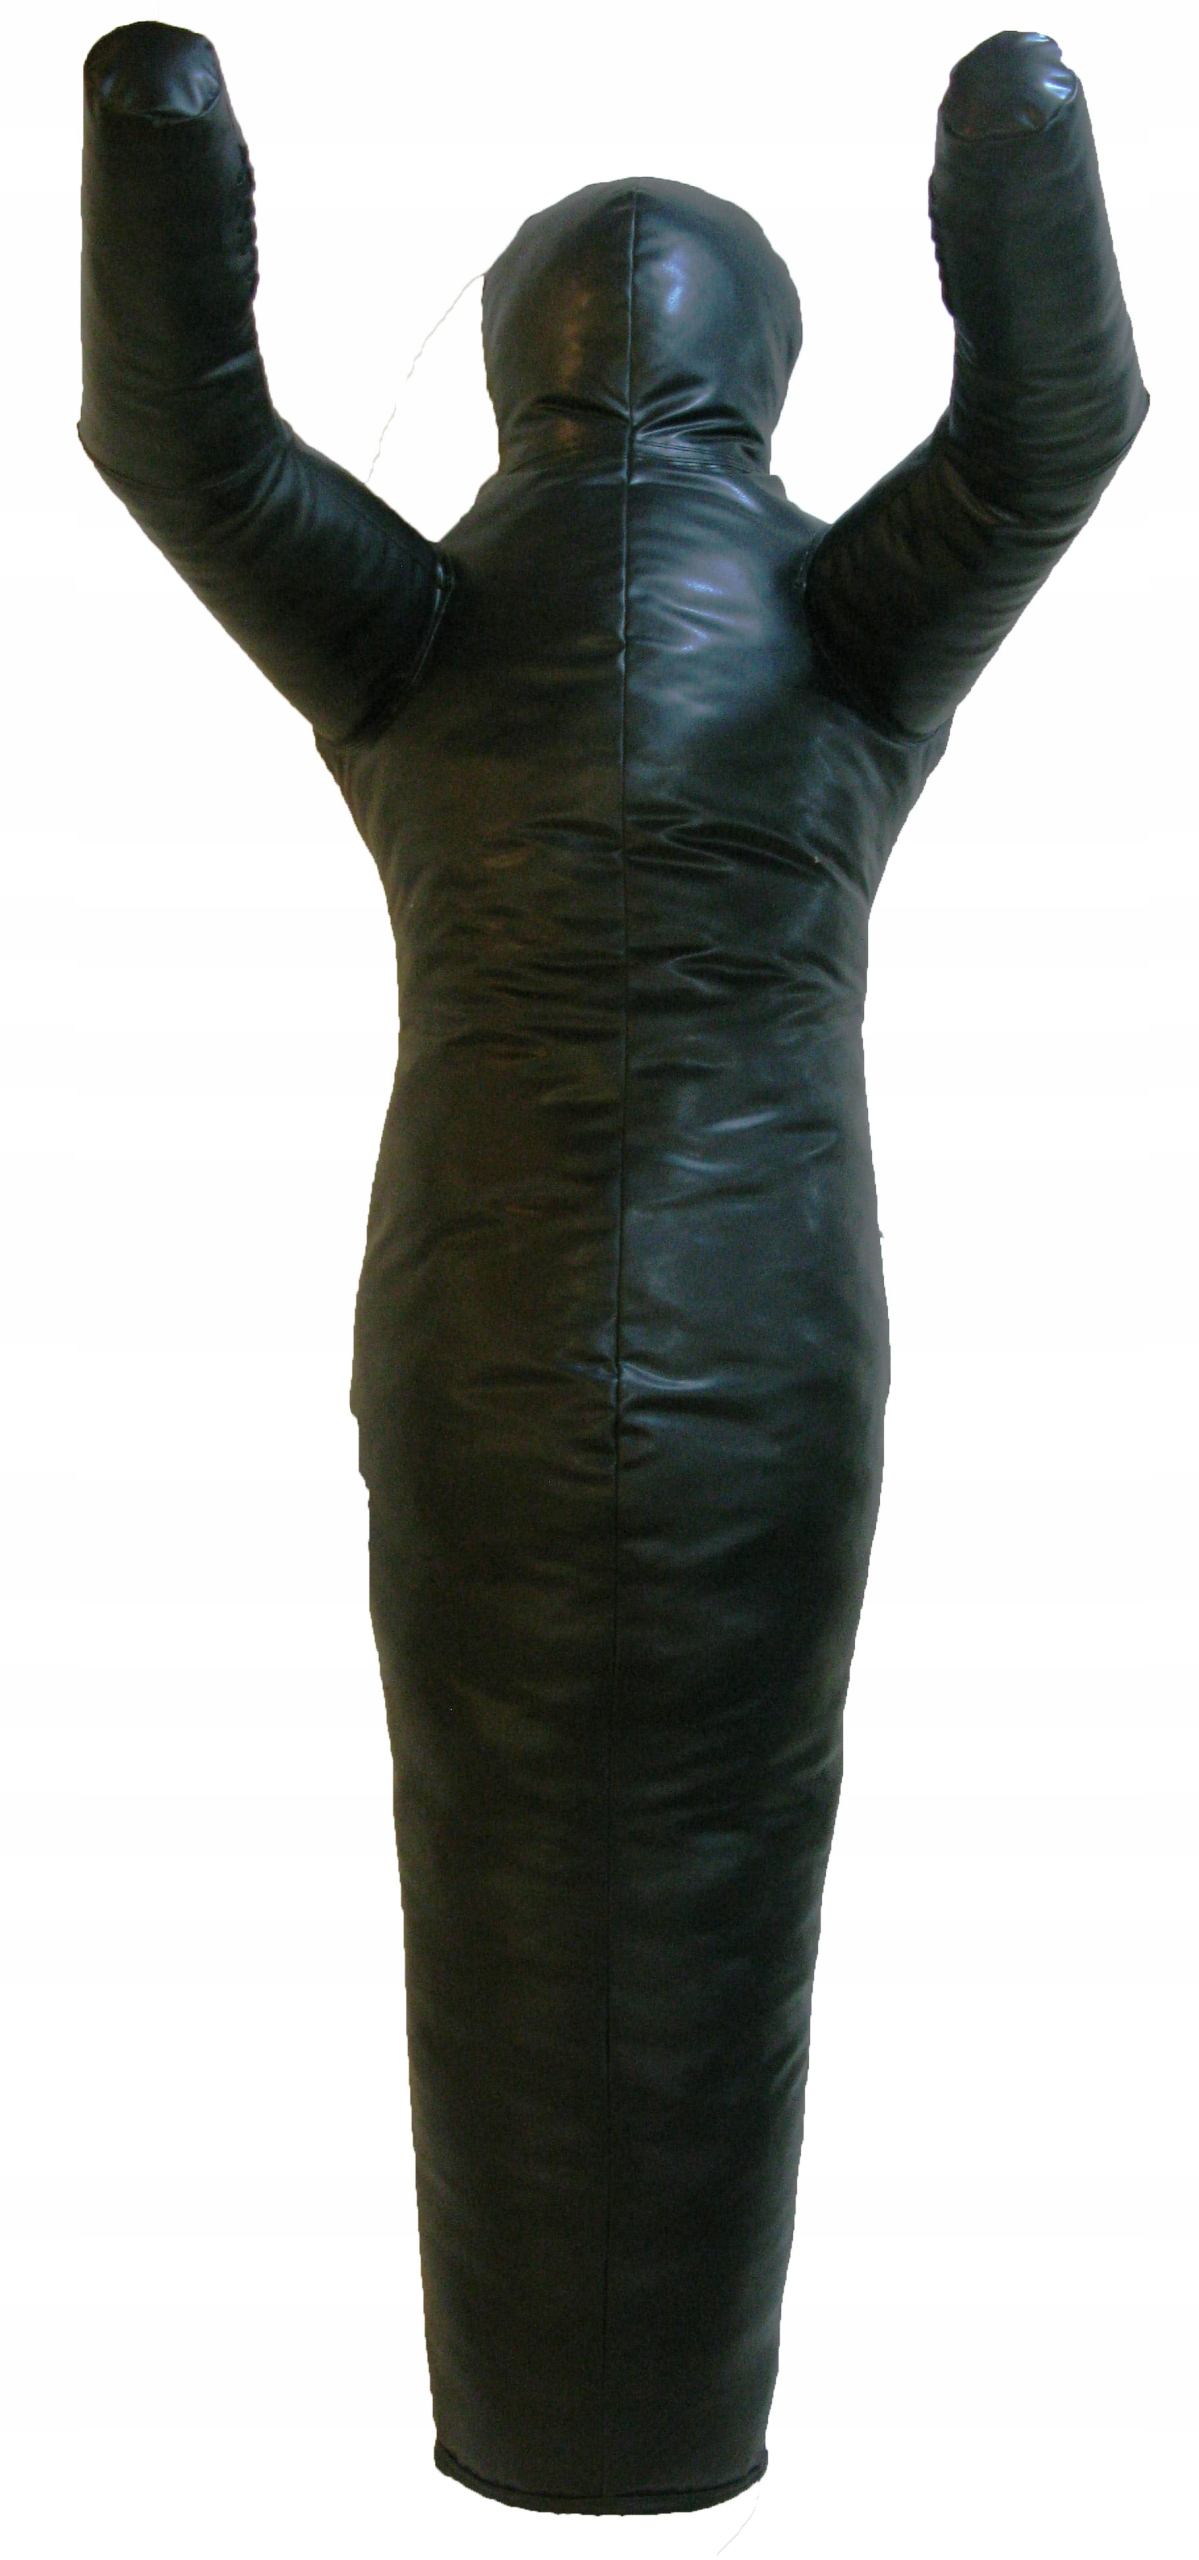 Manekin Wr. 165 cm / 35KG s PVC